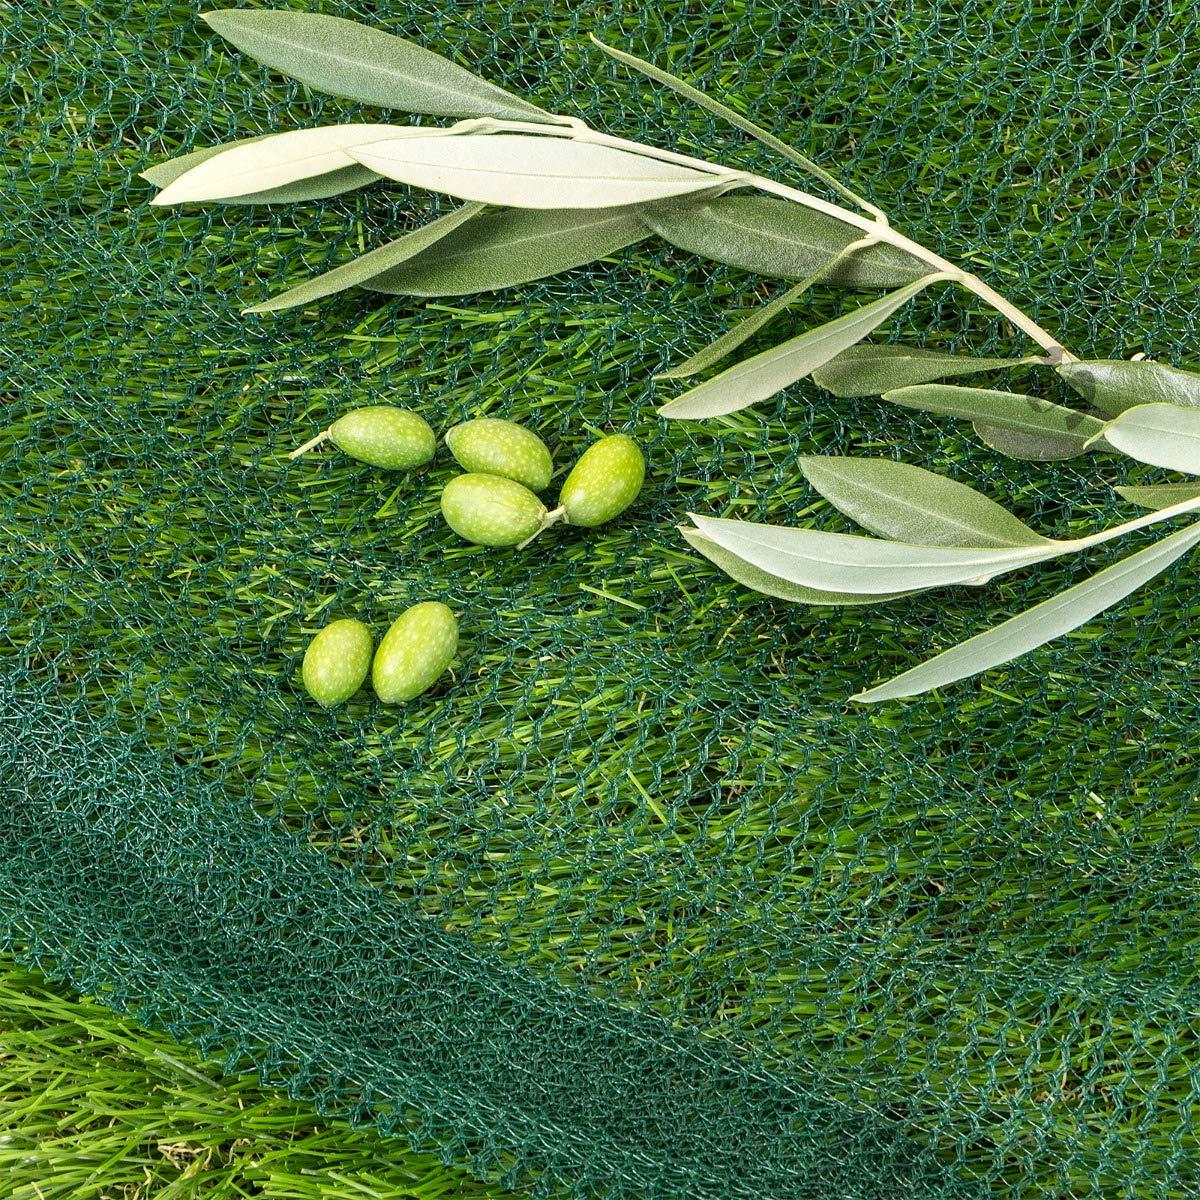 STI Rete Raccolta Olive Antispina 80-85gr//mq piegata 3x50 m stock